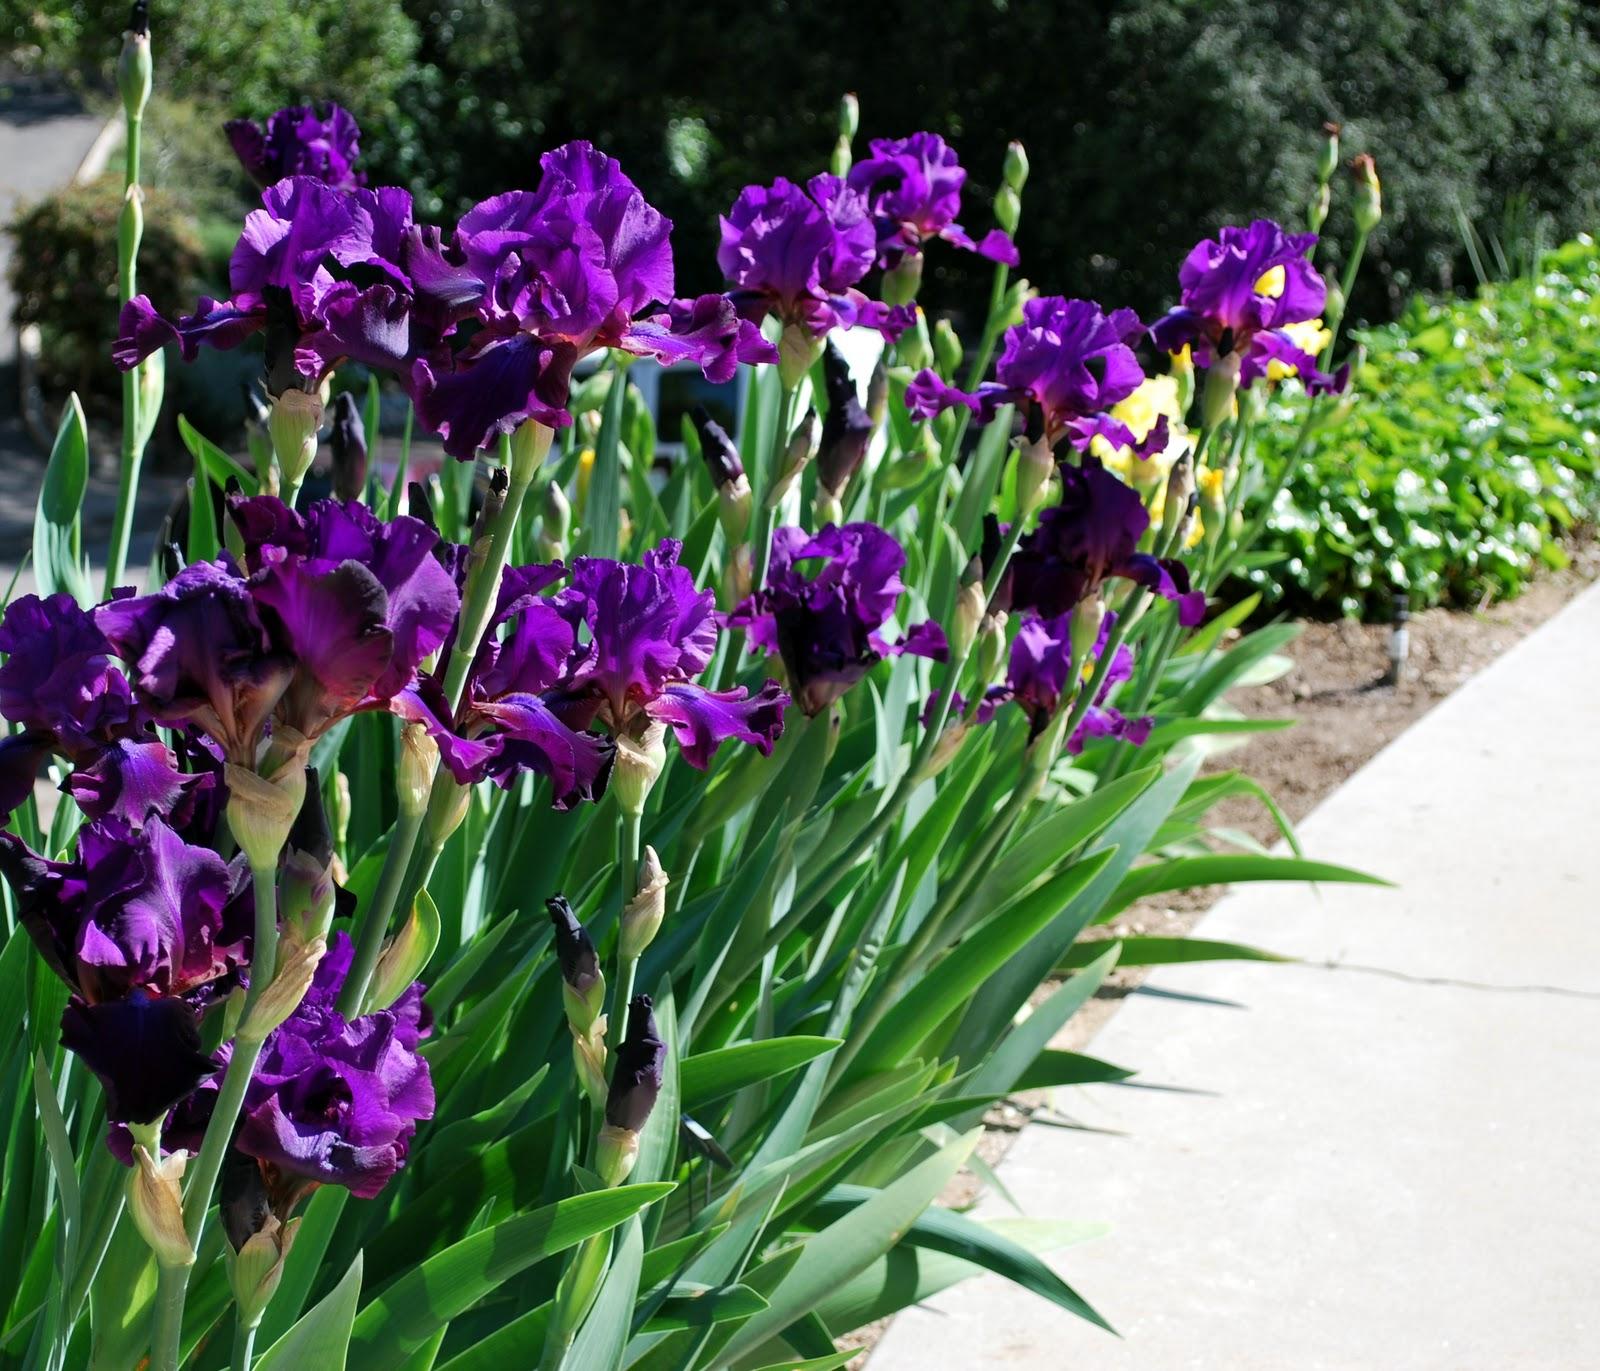 World of irises november 2011 tall bearded iris scoonchee in loiss garden izmirmasajfo Gallery